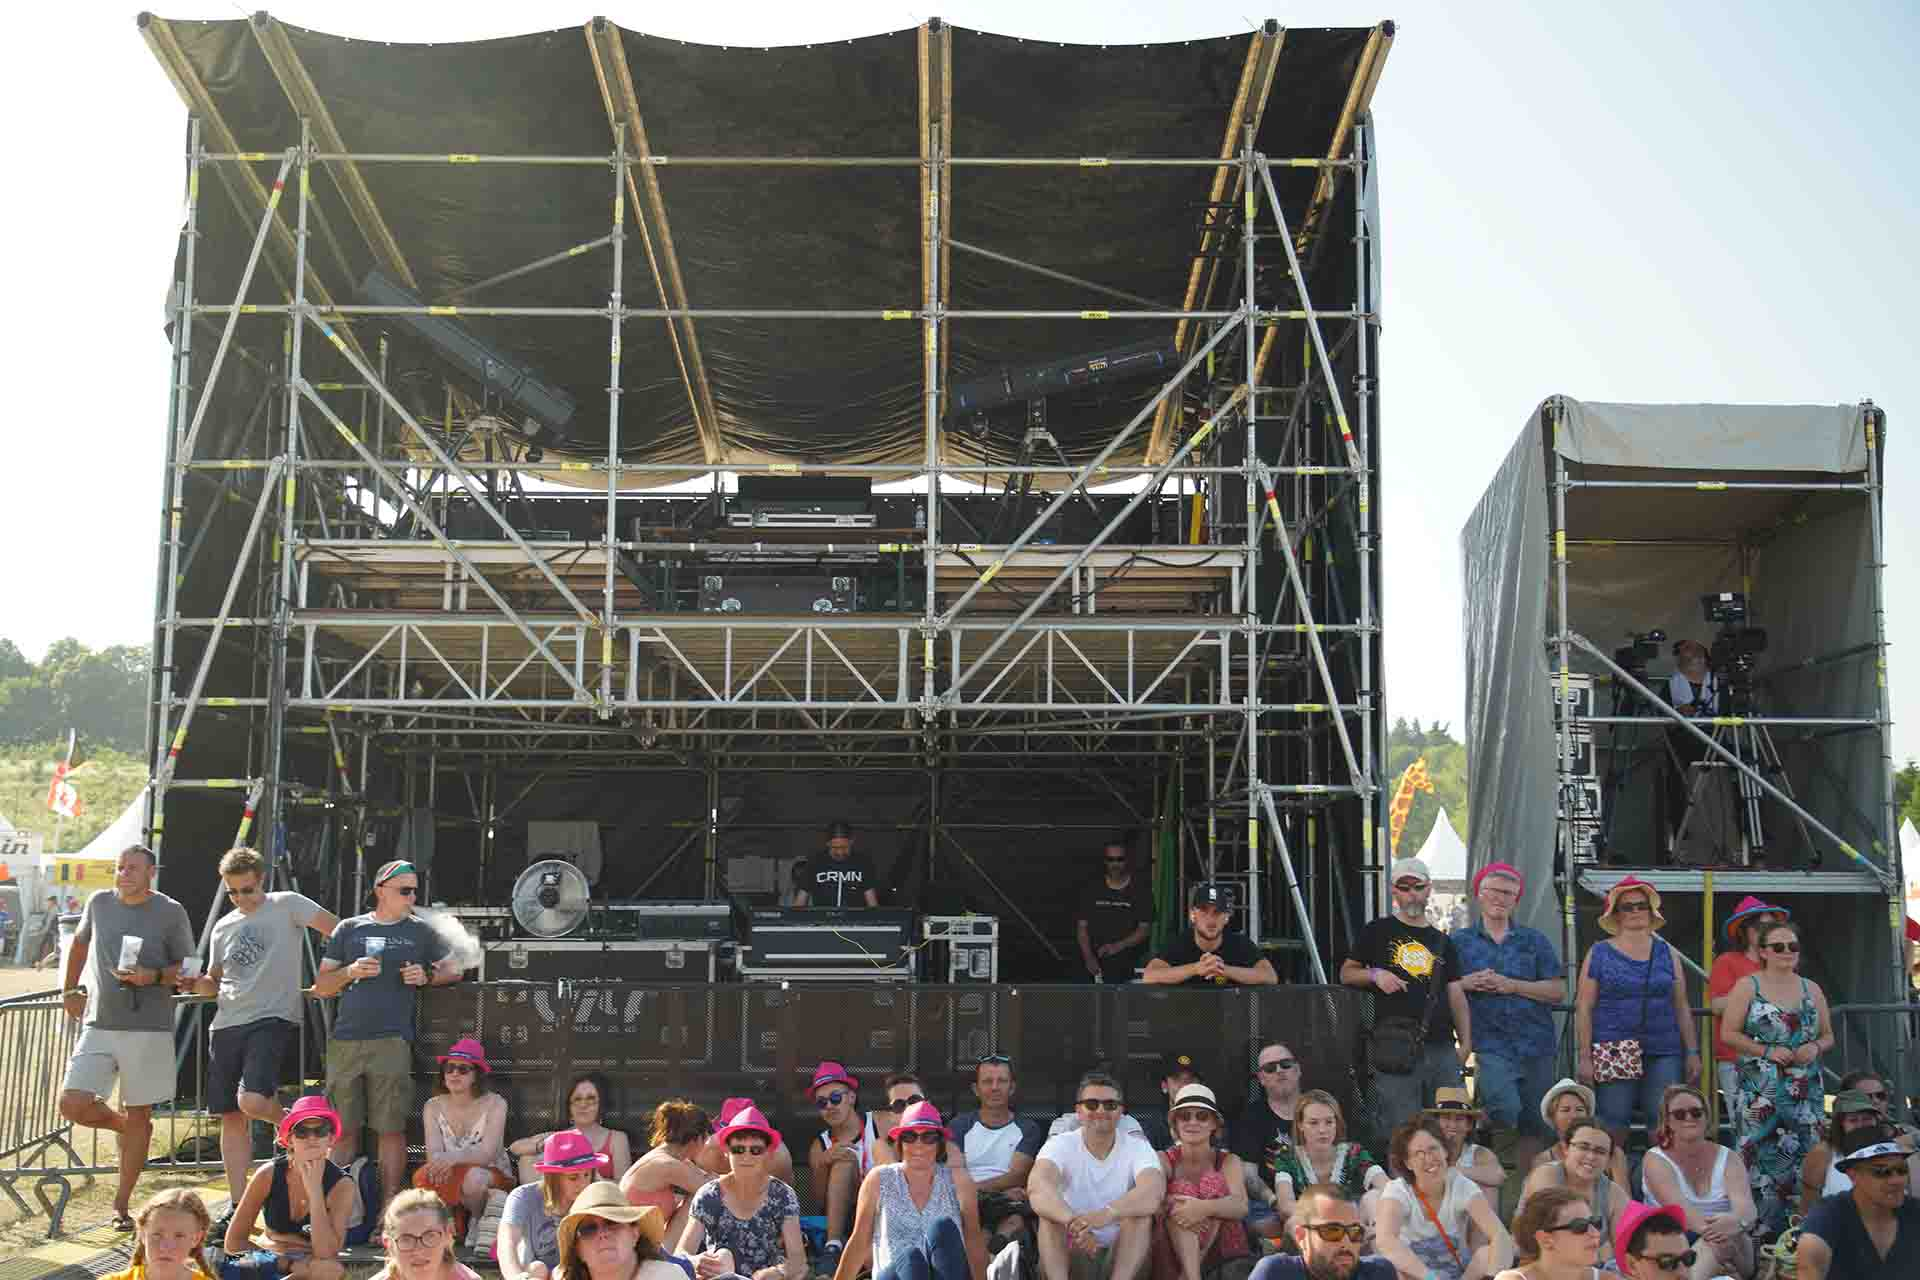 festival-public-securite-ordre-universal-normandie